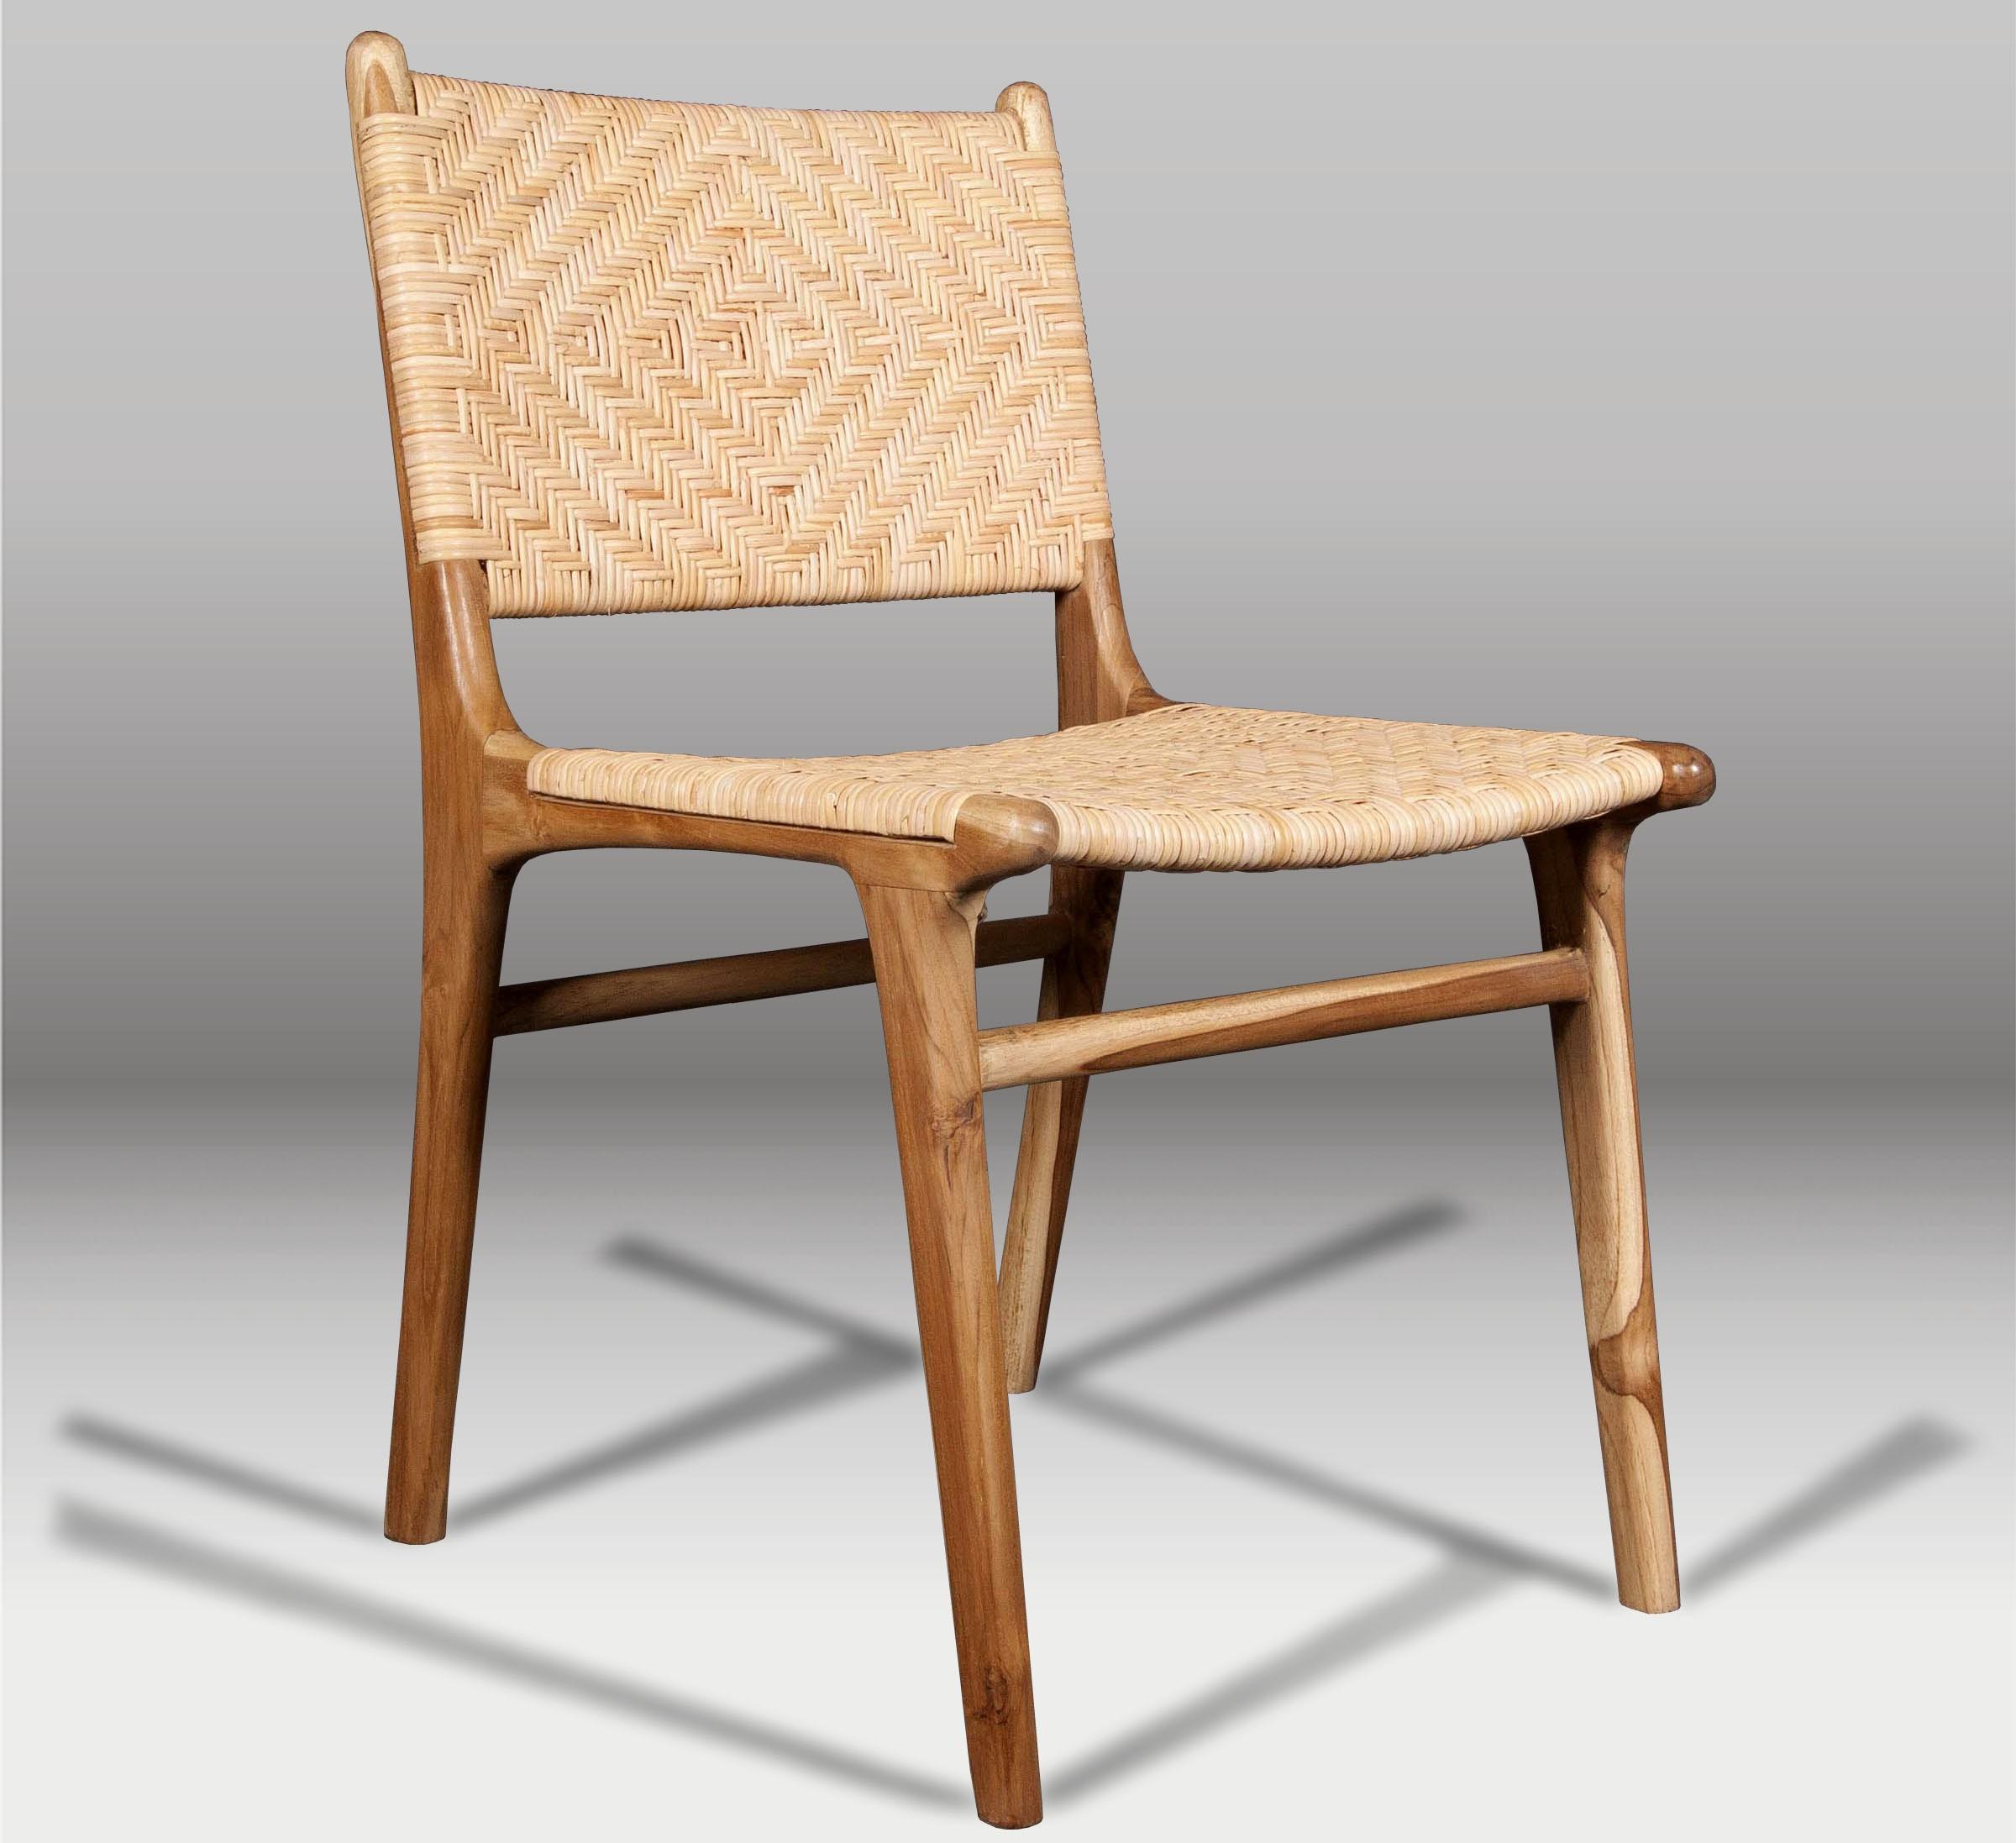 Silla de comedor y silla de madera batavia for Sillas apilables comedor